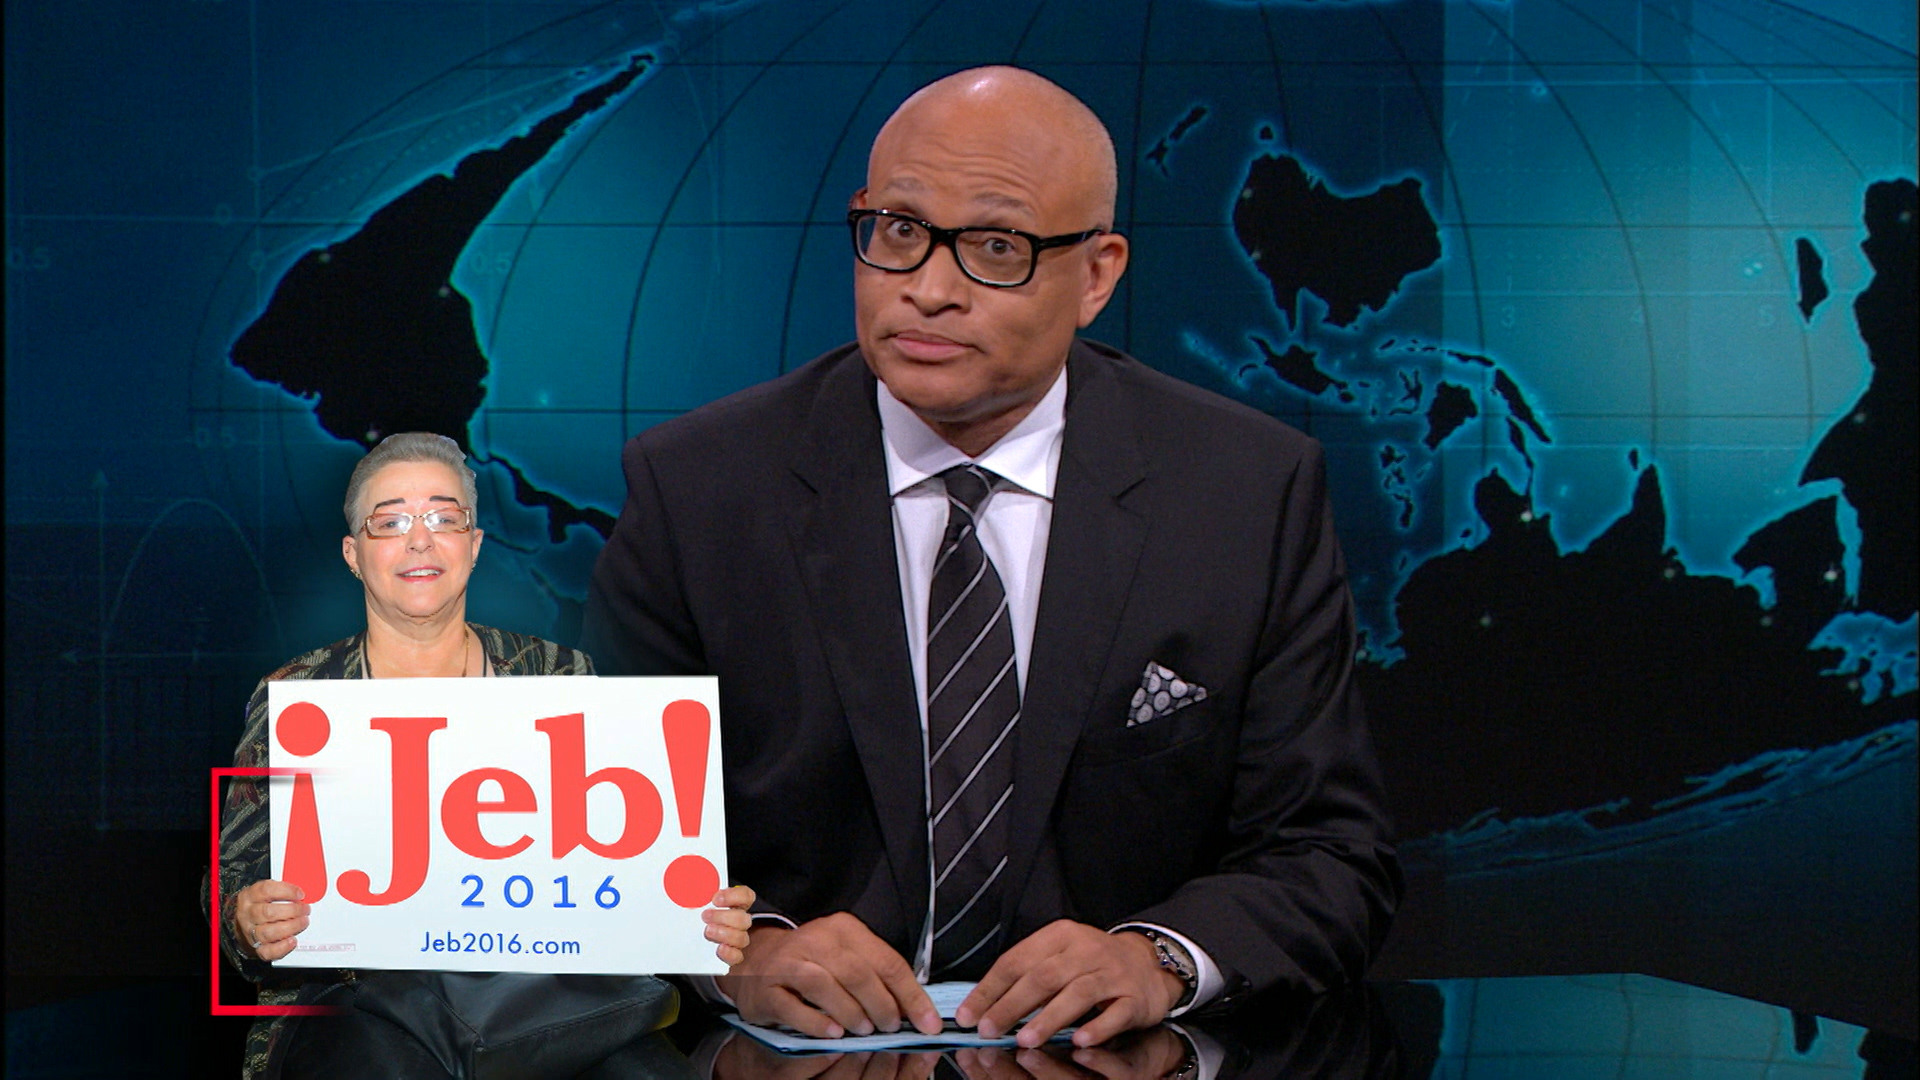 August 13, 2015 - Jeb Bush, Bernie Sanders & Hillary Clinton